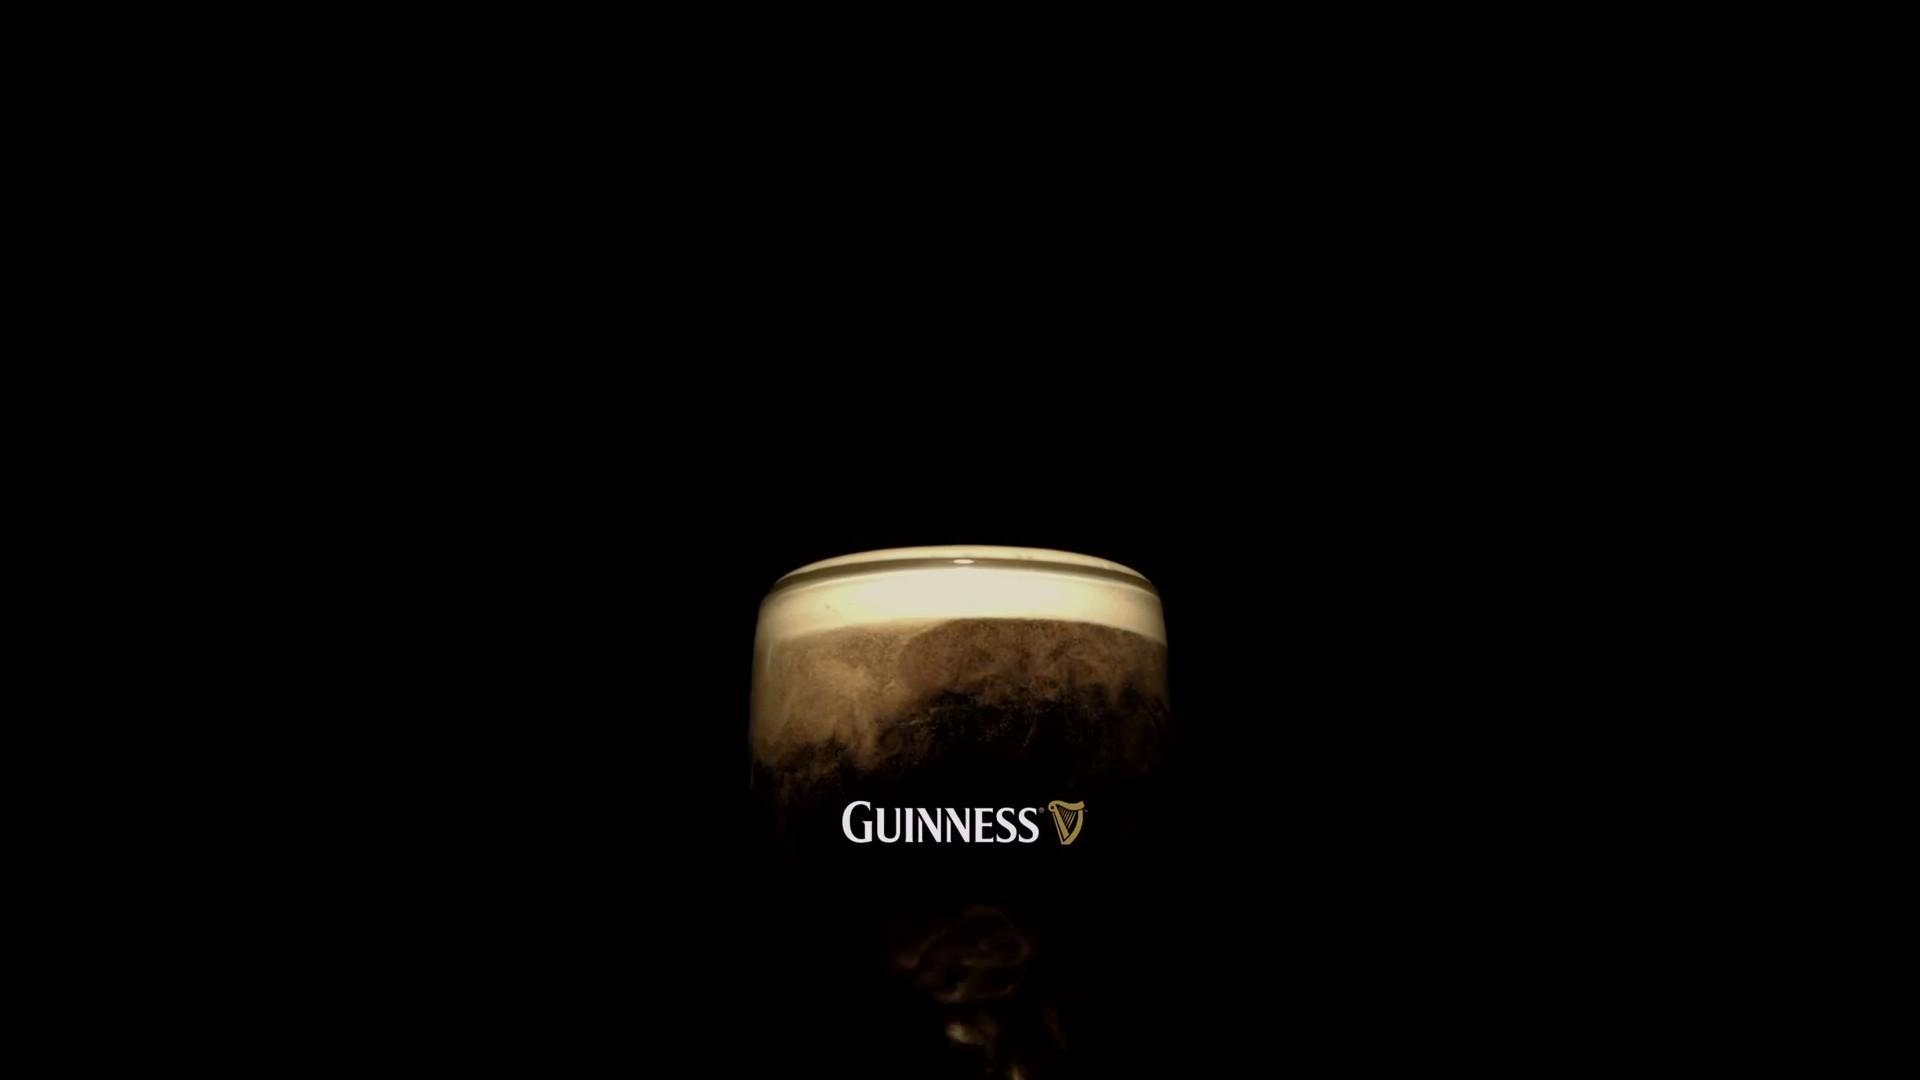 irish beer wallpaper hd - photo #11